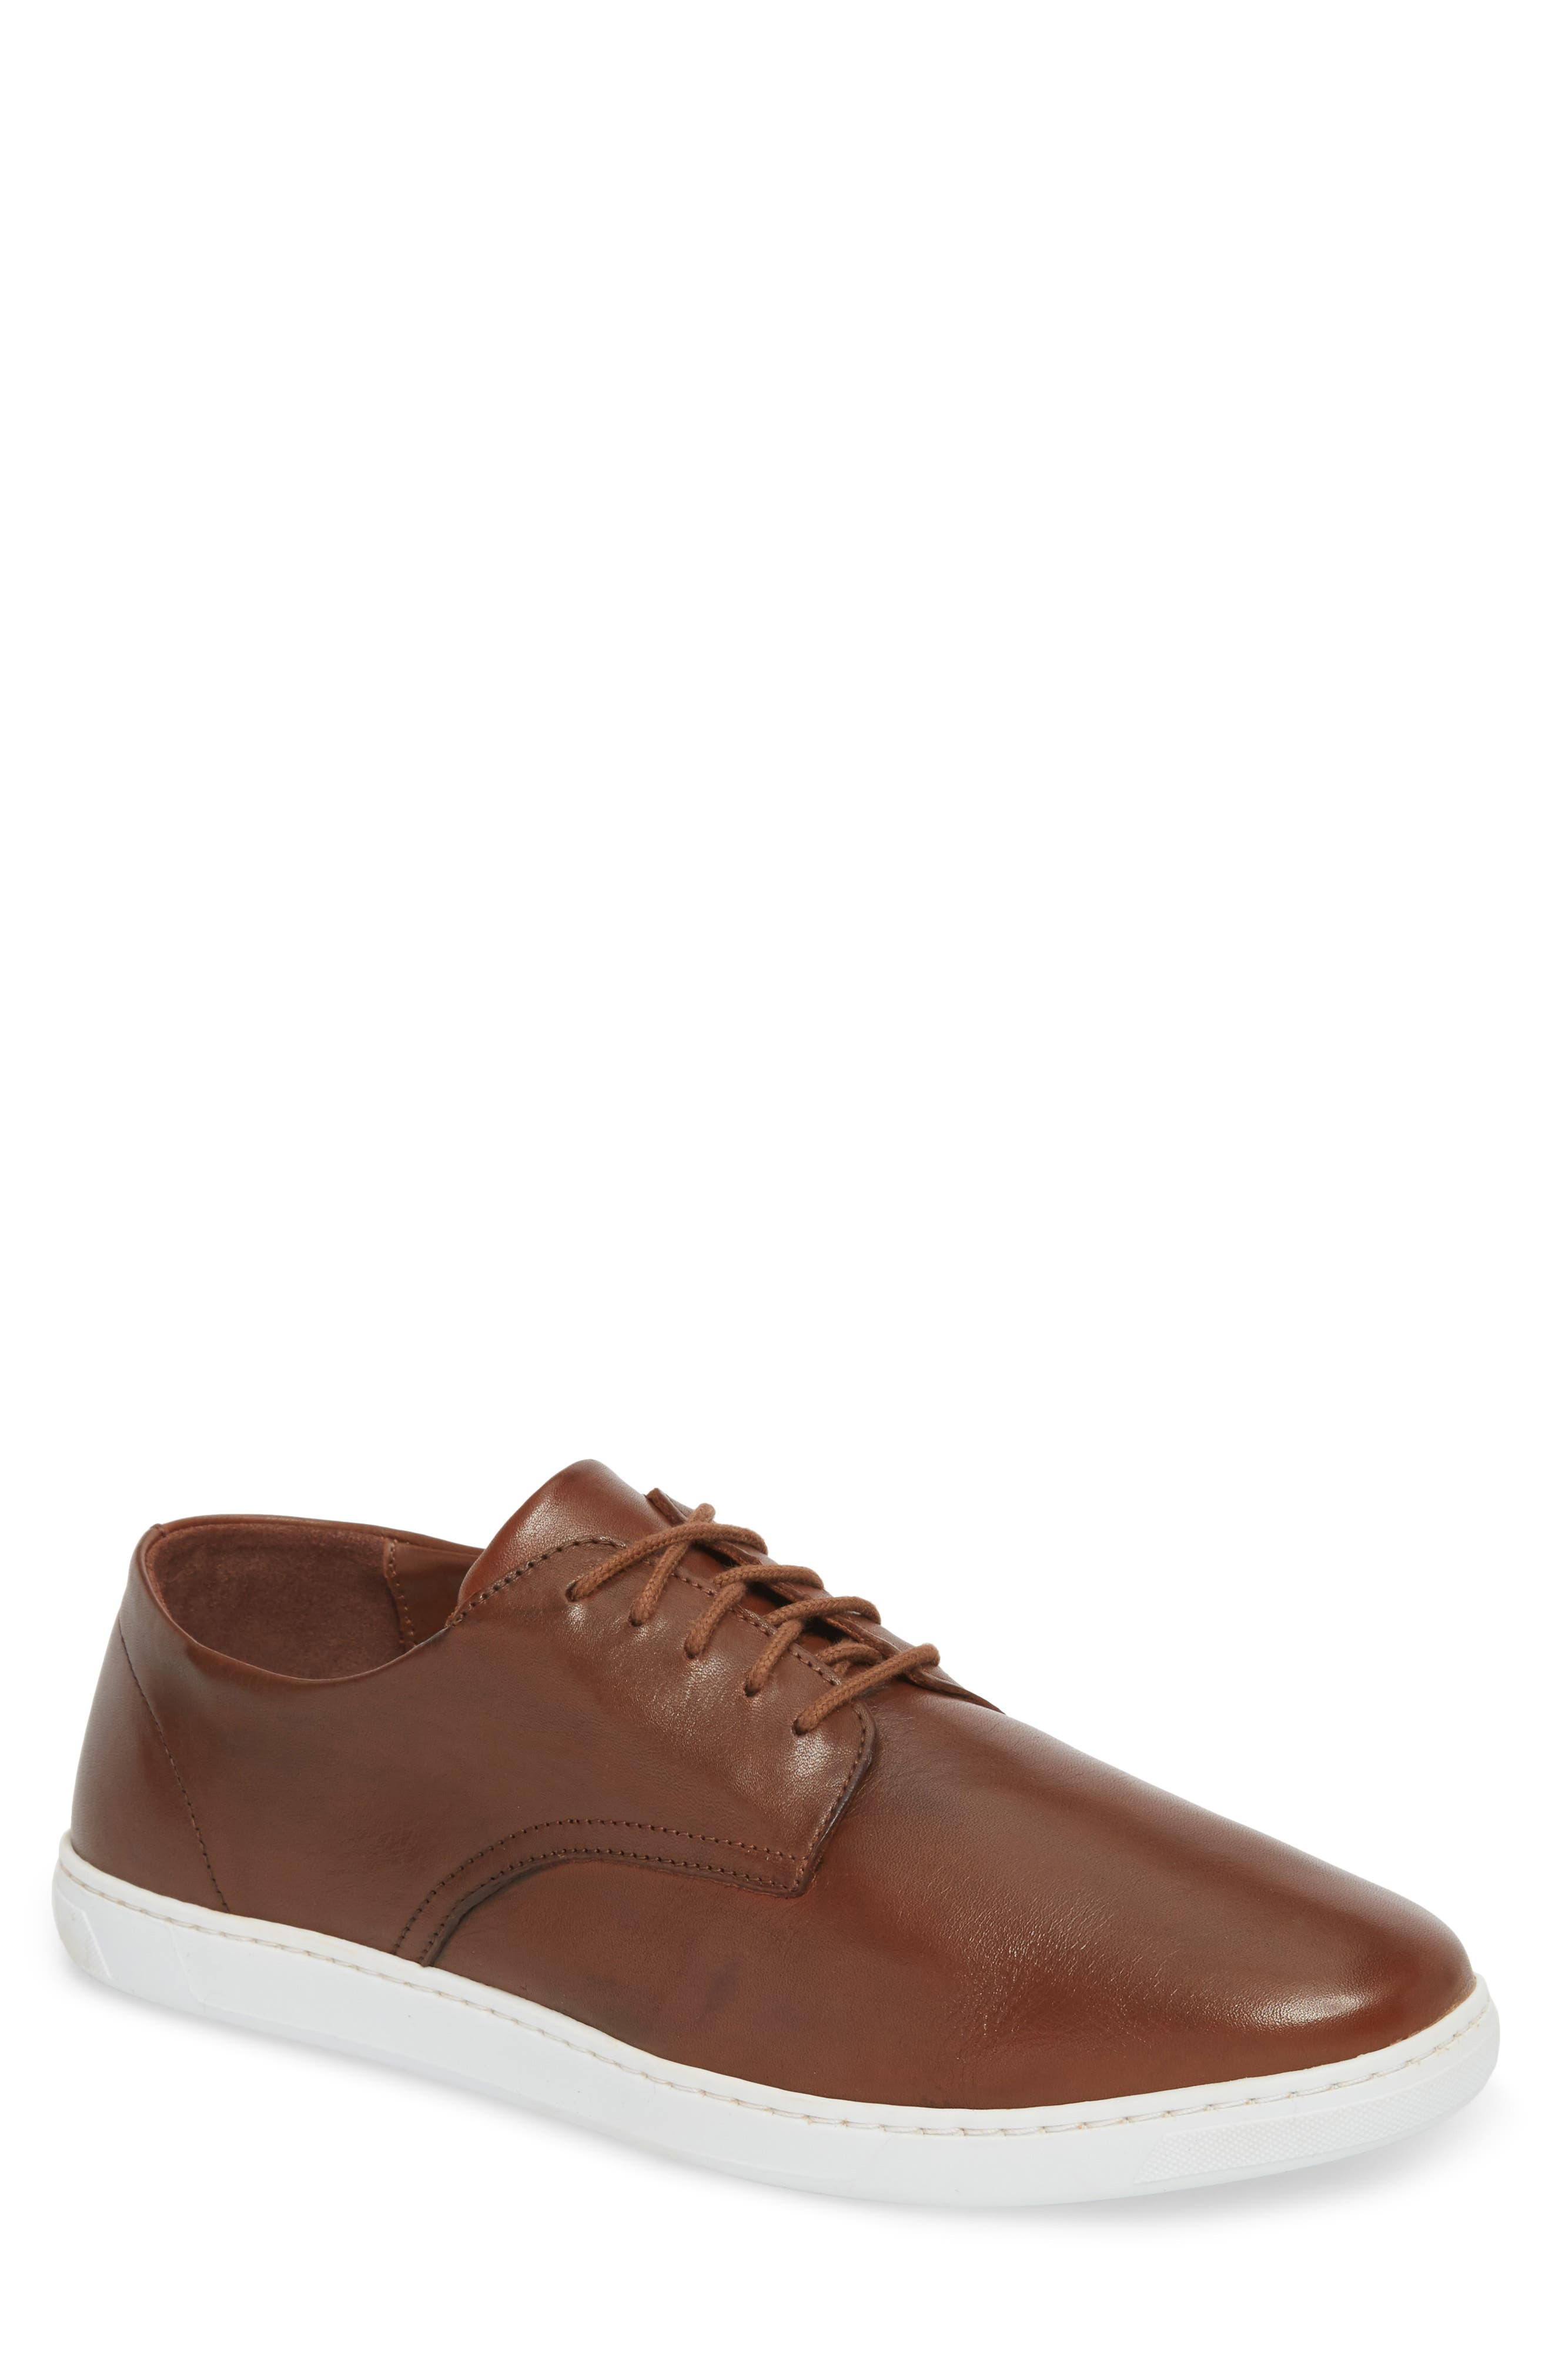 Nok Derby Sneaker,                         Main,                         color, Brown Leather